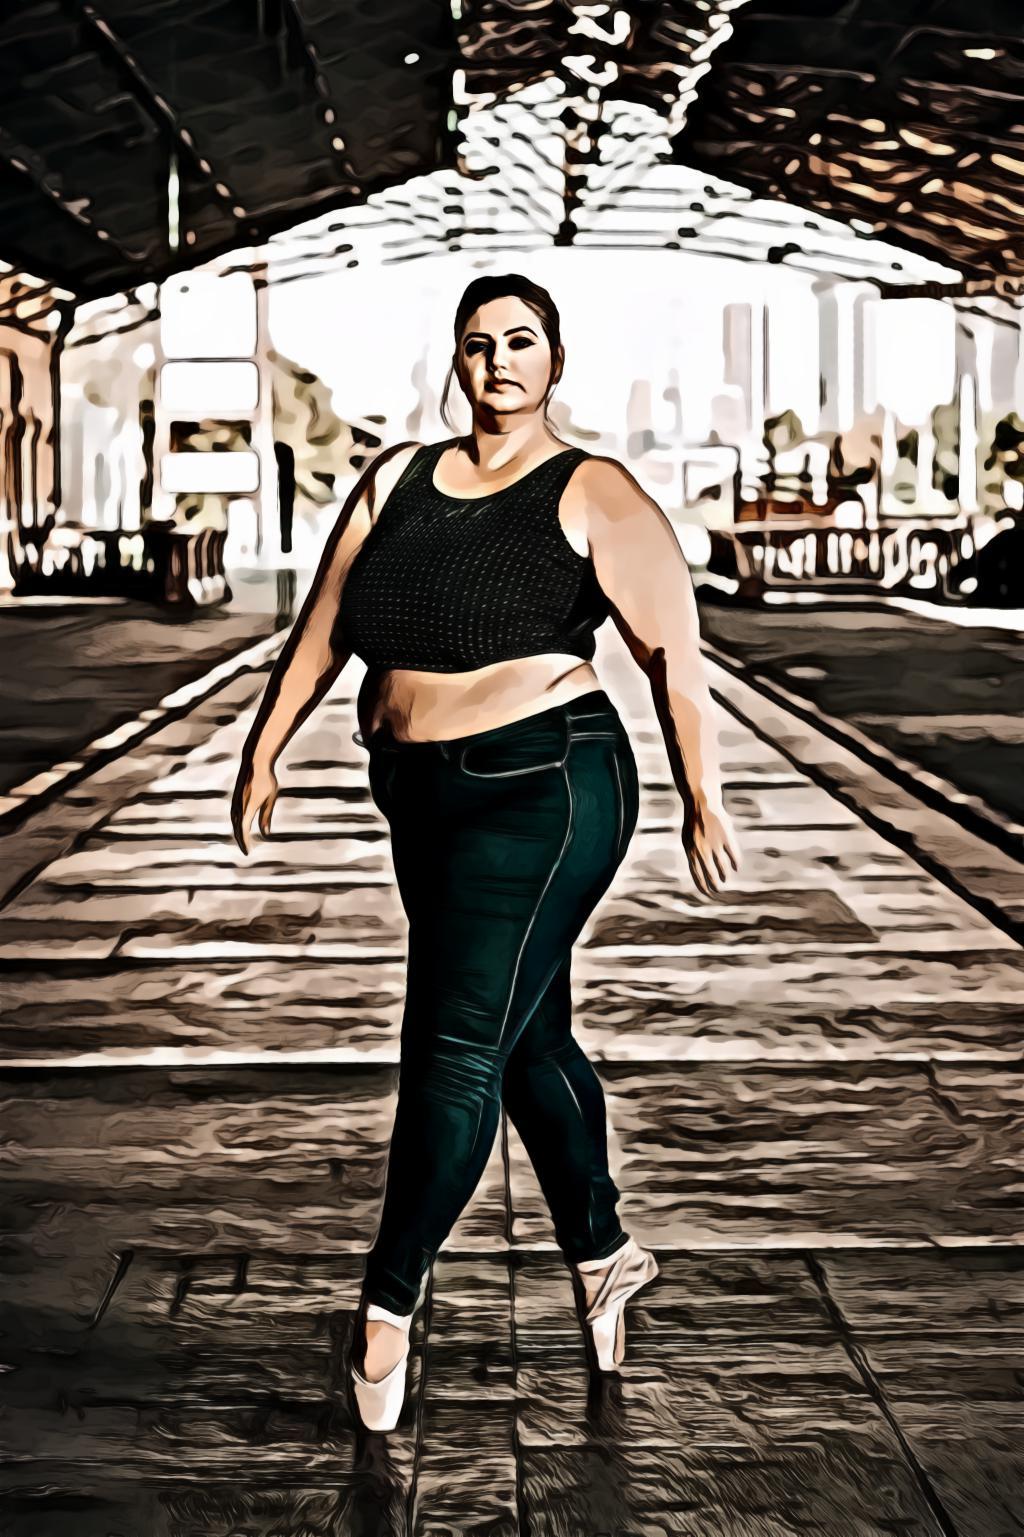 Portrait of woman doing tiptoe